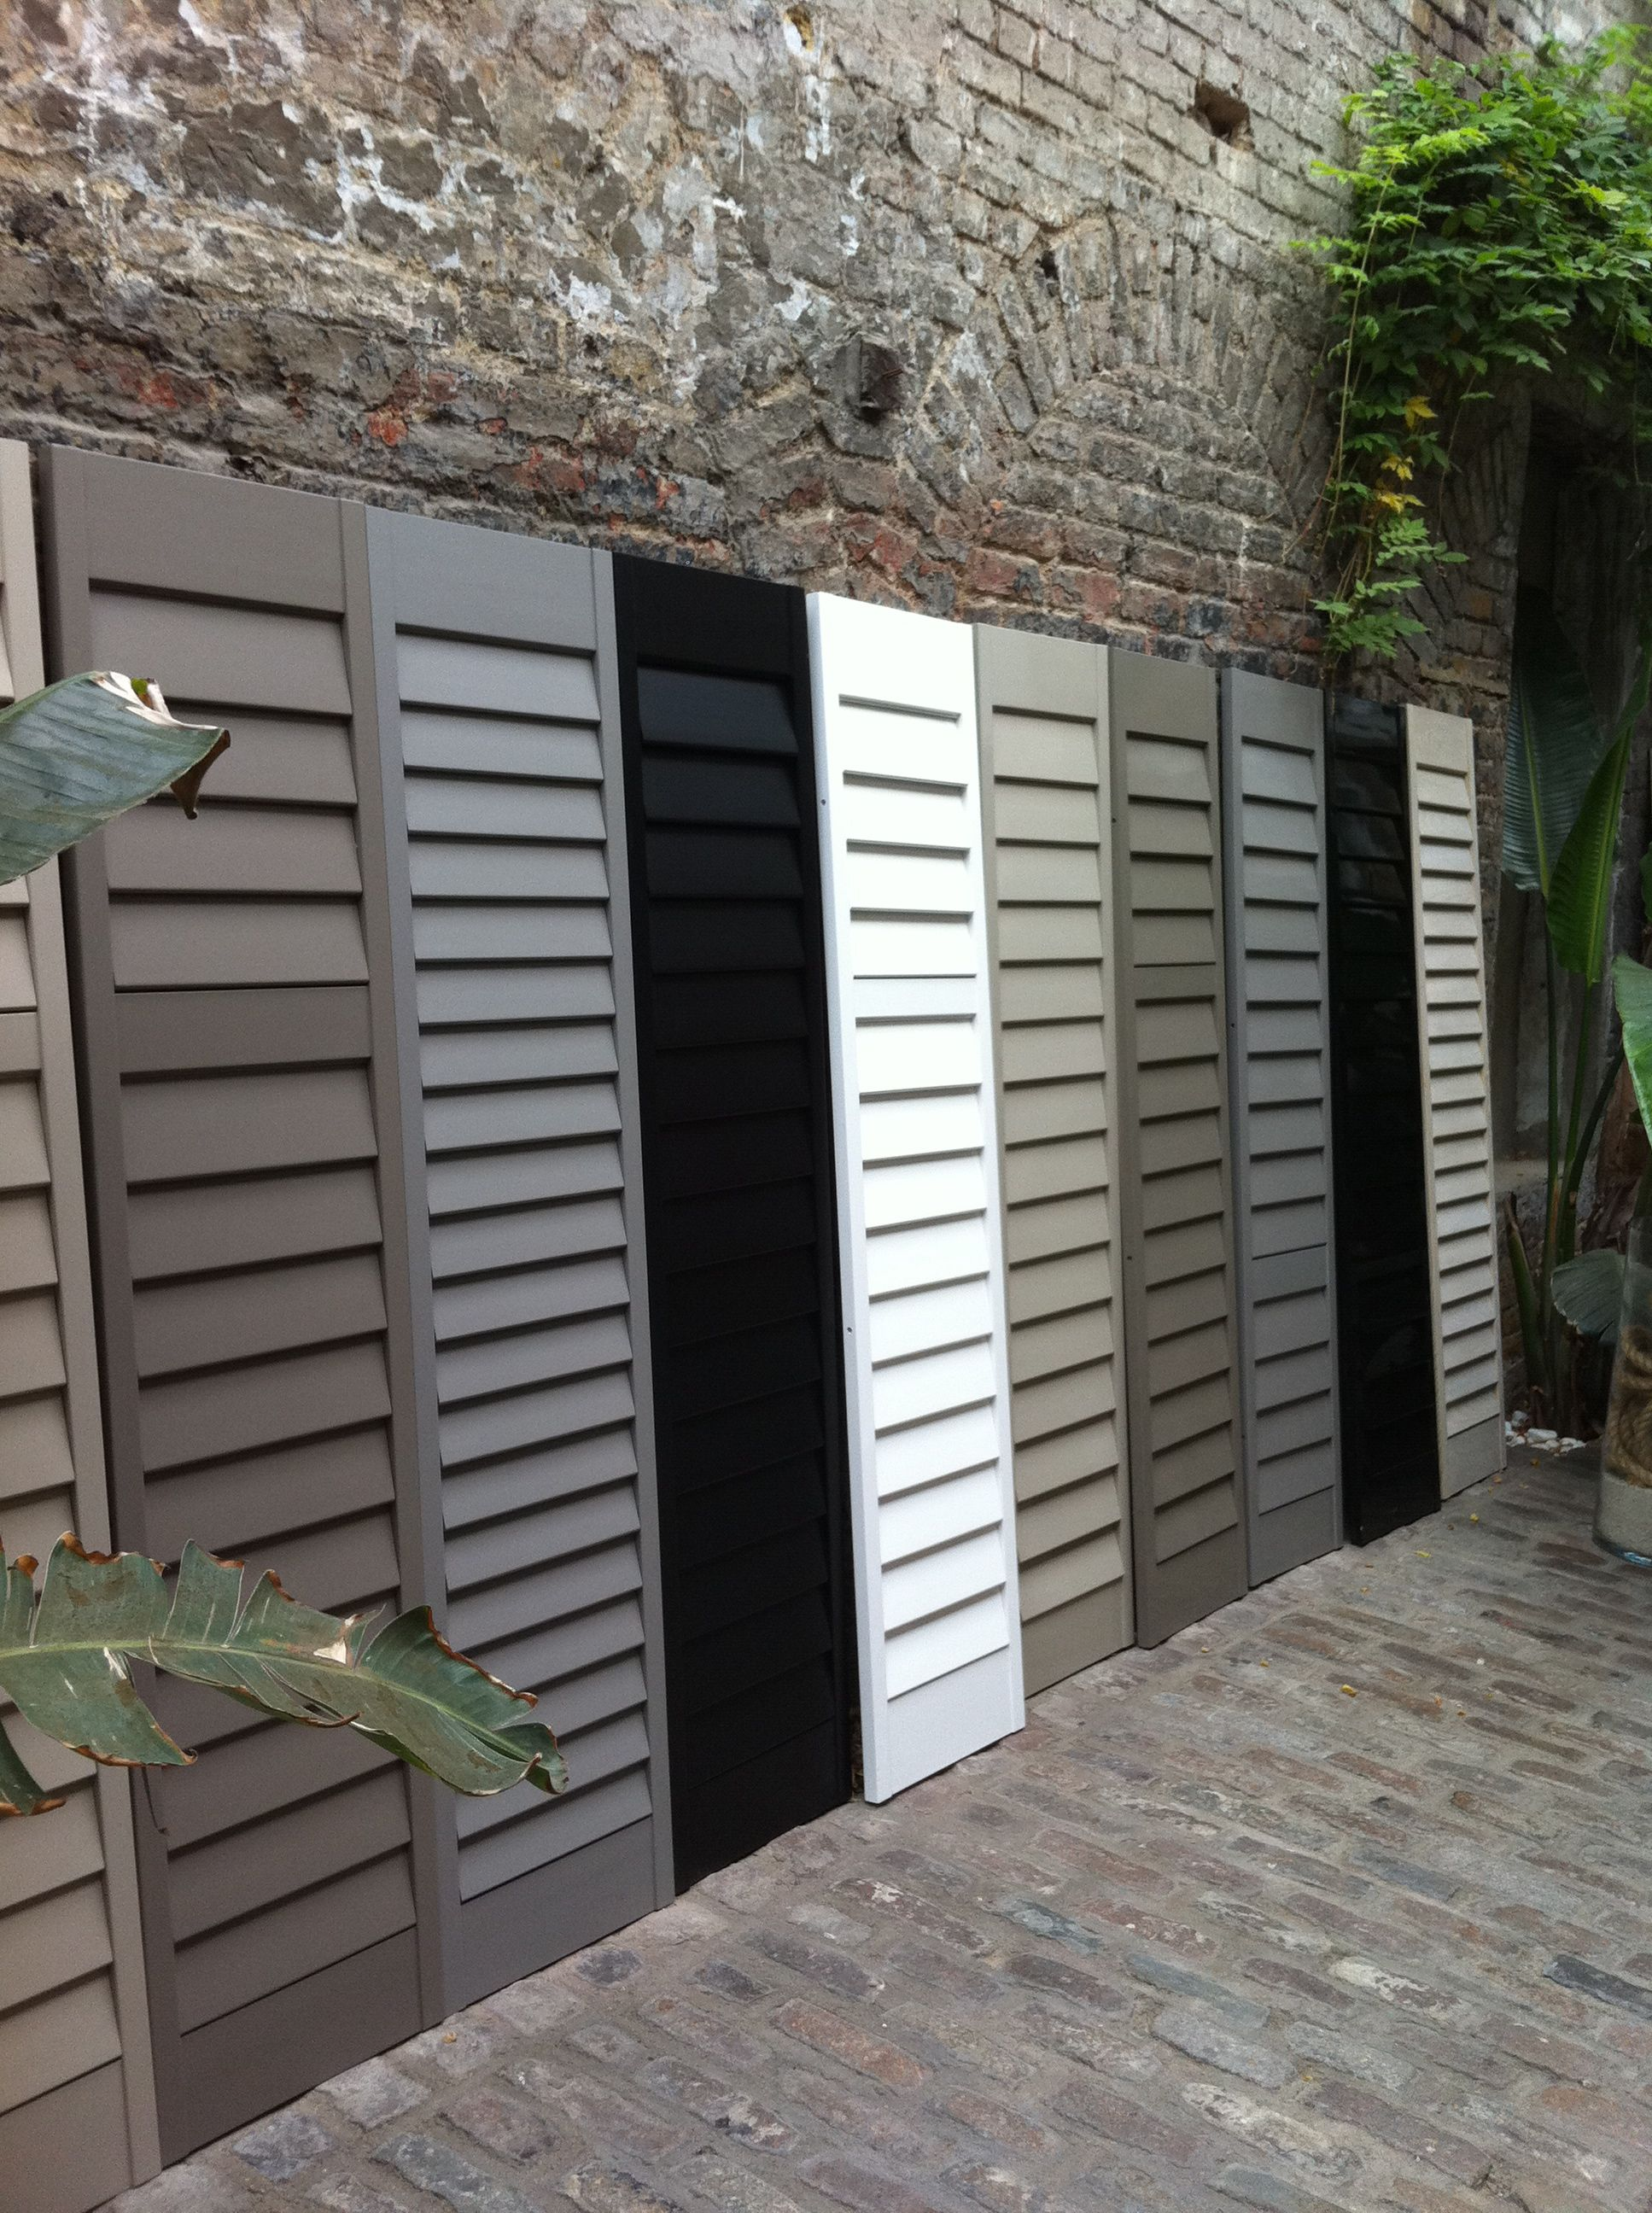 kelly hoppen shutters interiors pinterest fensterl den fenster und jalousien. Black Bedroom Furniture Sets. Home Design Ideas